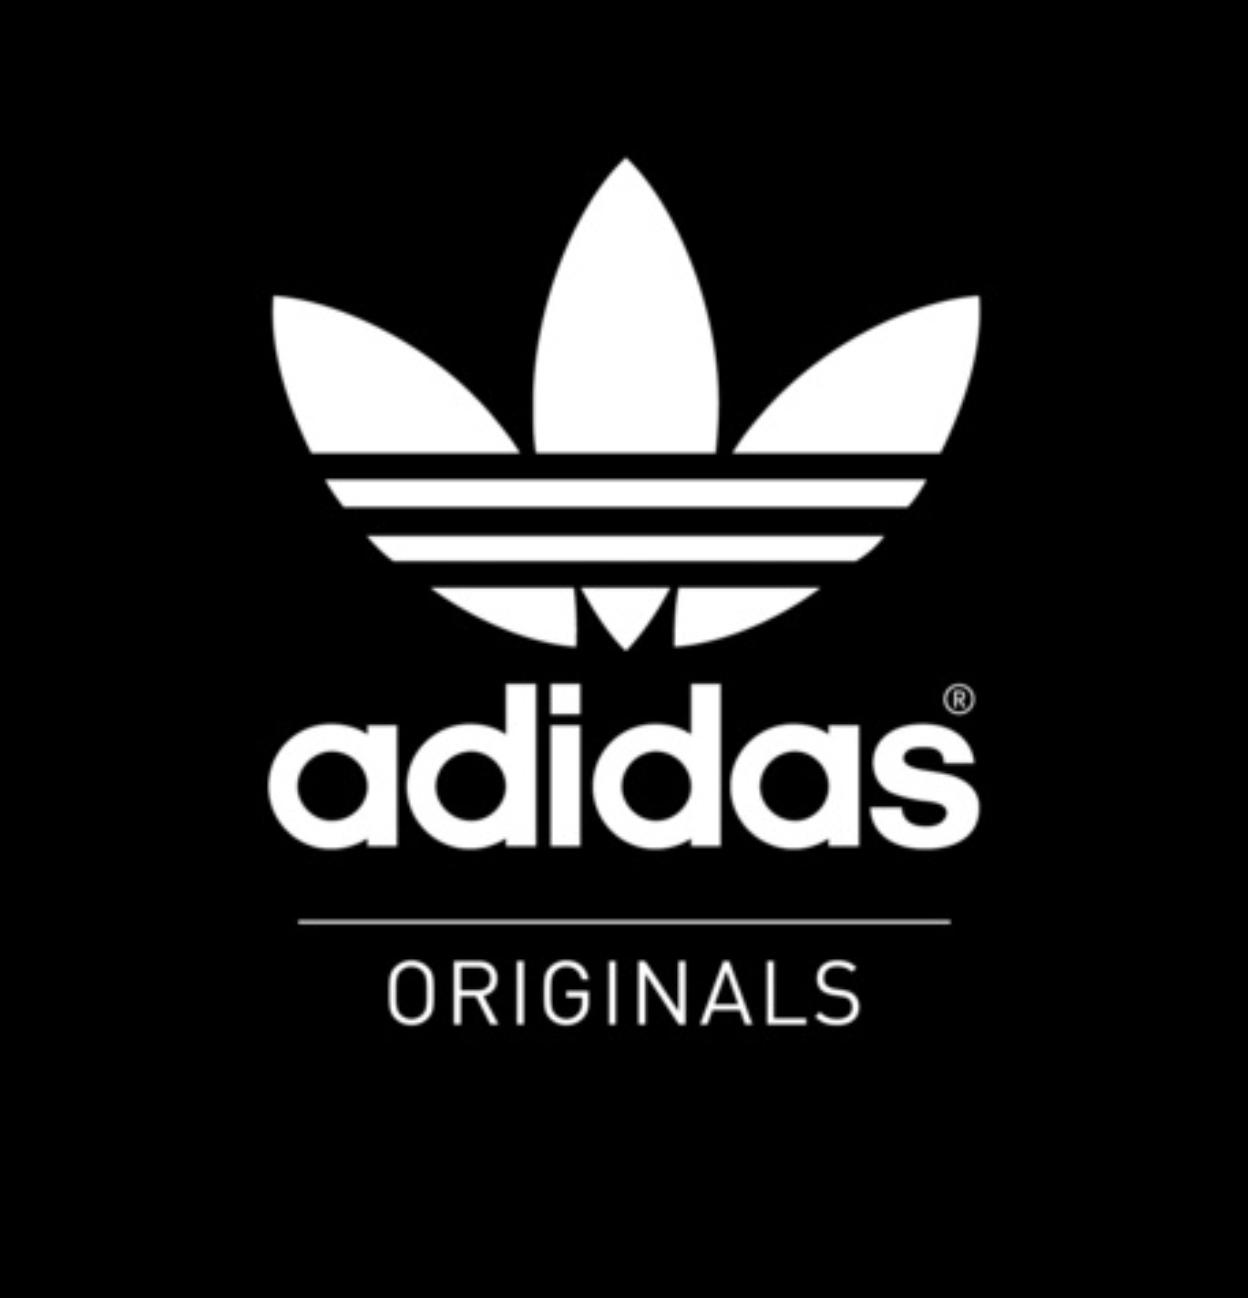 20% Rabatt auf ALLES bei Adidas [Lokal Ochtrup DOC] [ NUR AM 02.09.]